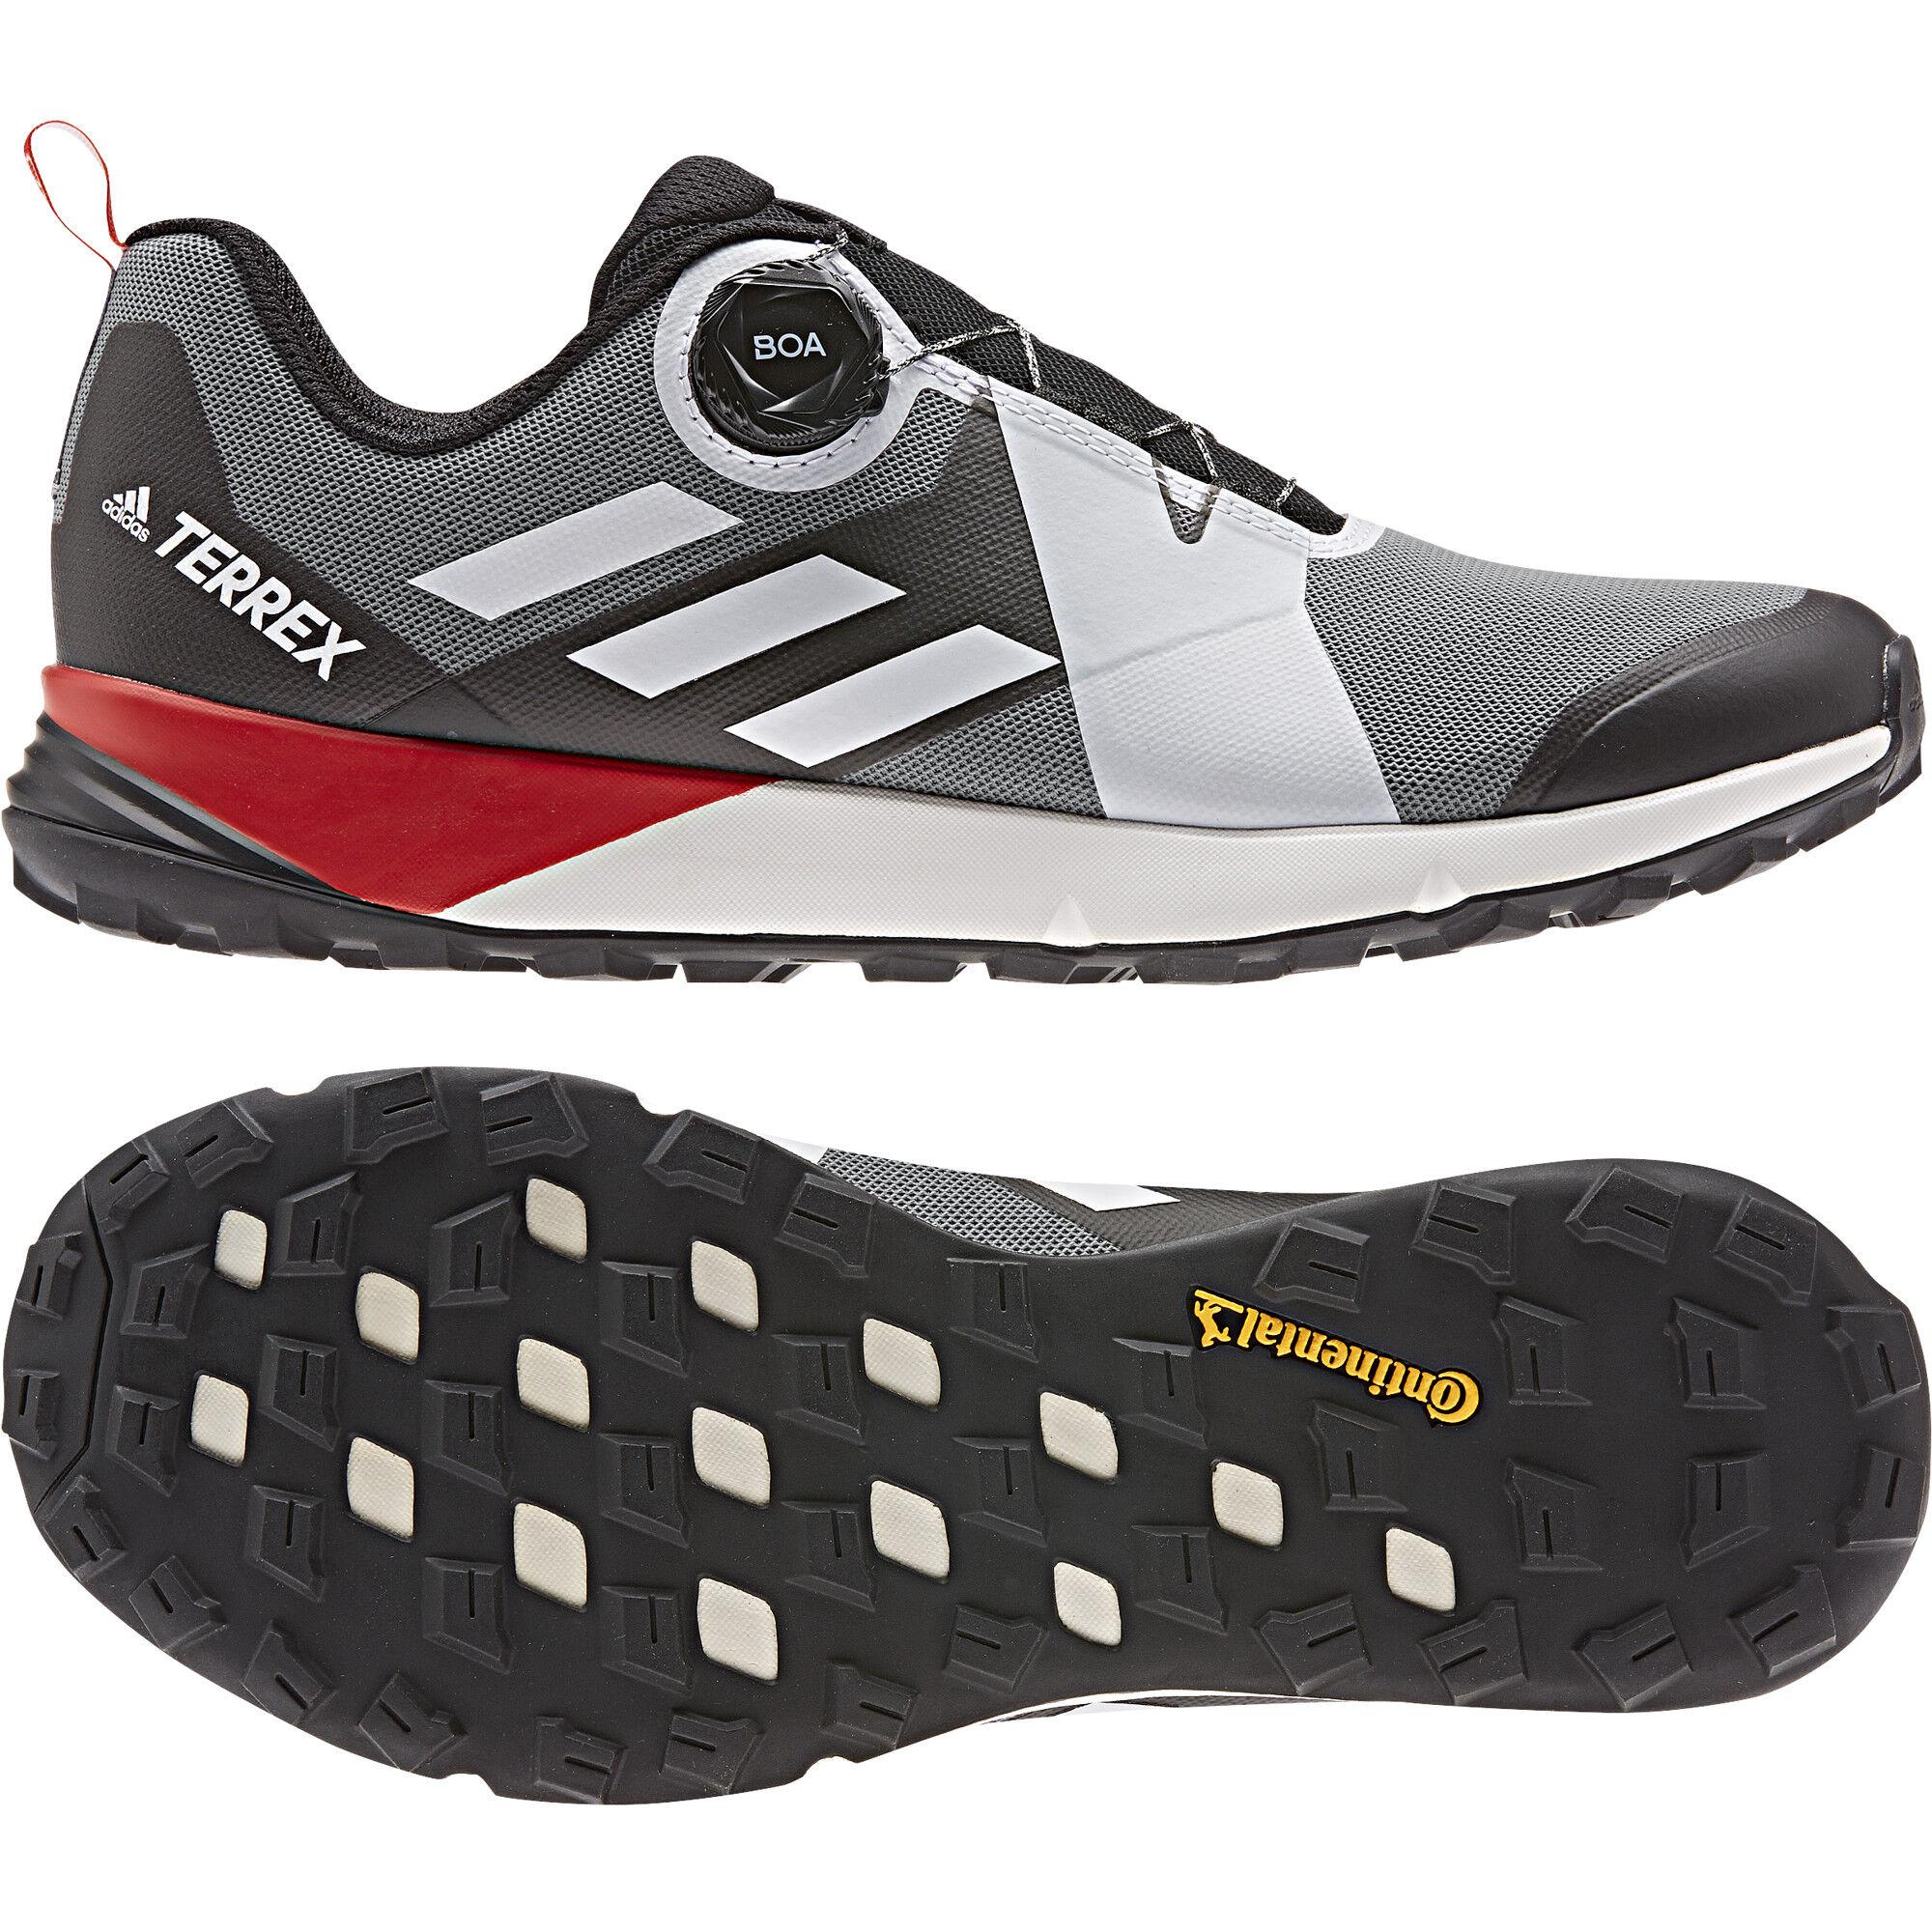 Adidas Terrex Two GTX Trail running shoes Men's   Buy